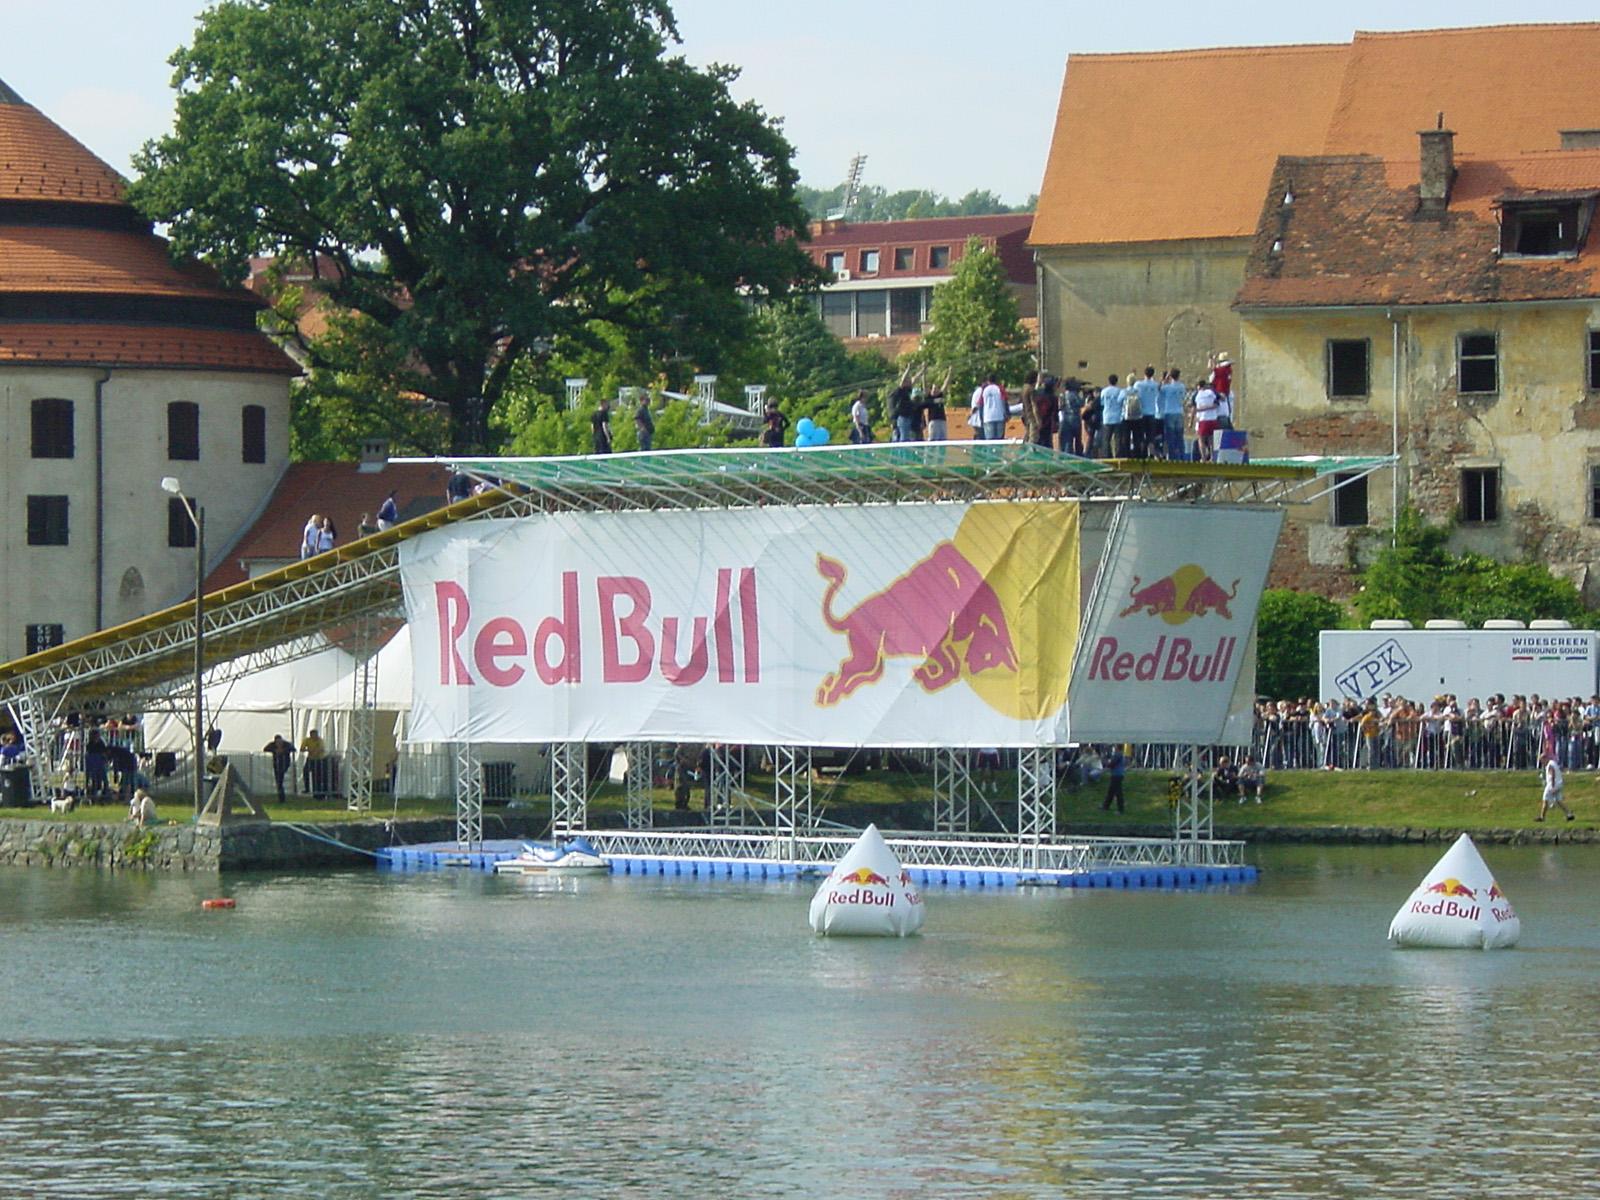 Red Bull, спортивные мероприятия на воде